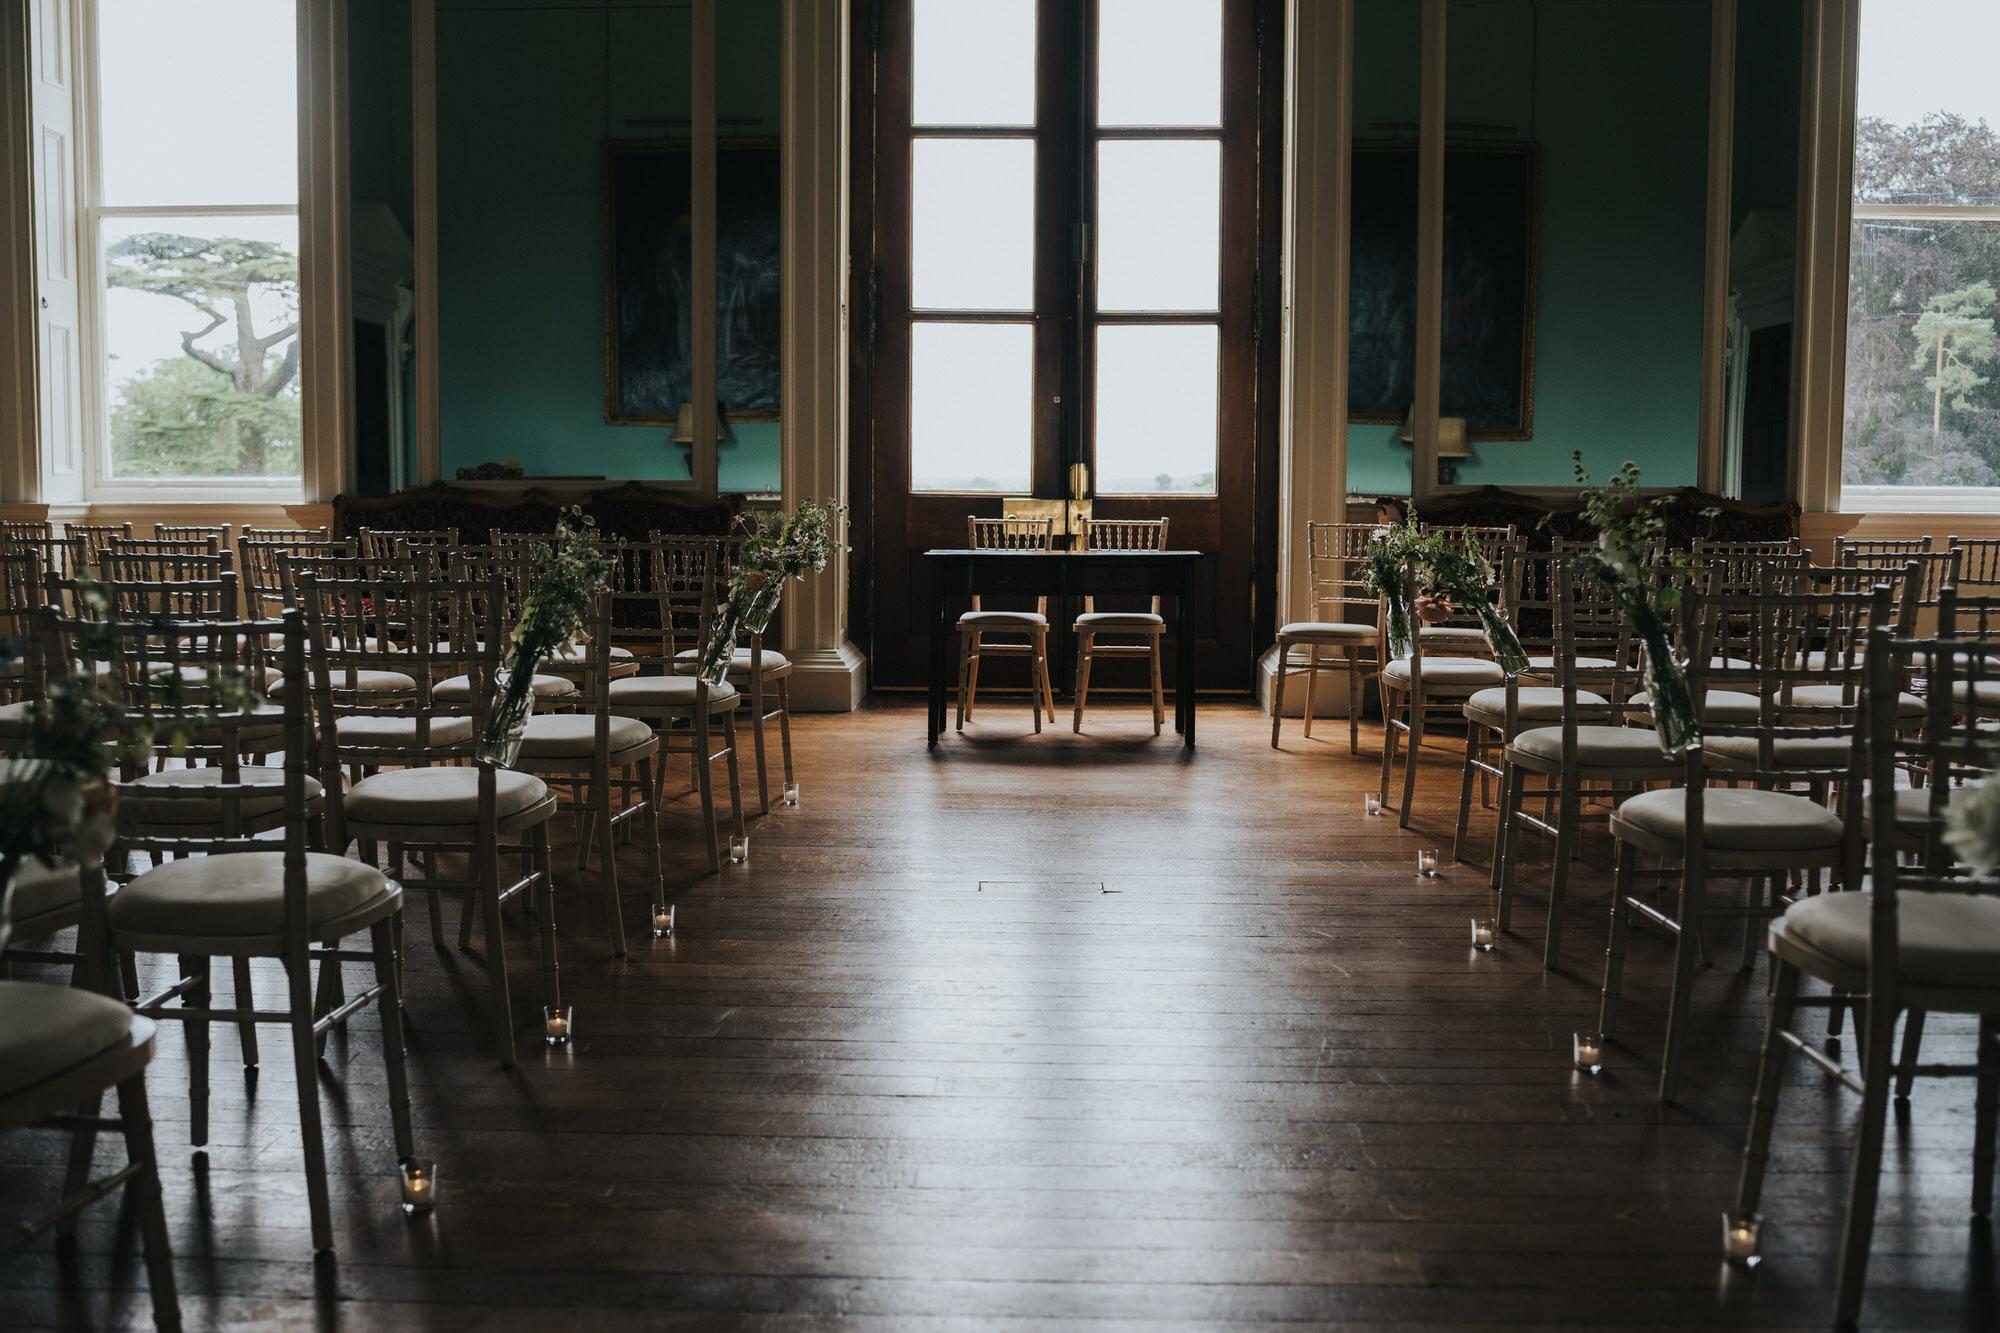 Kirtlington park ceremony room